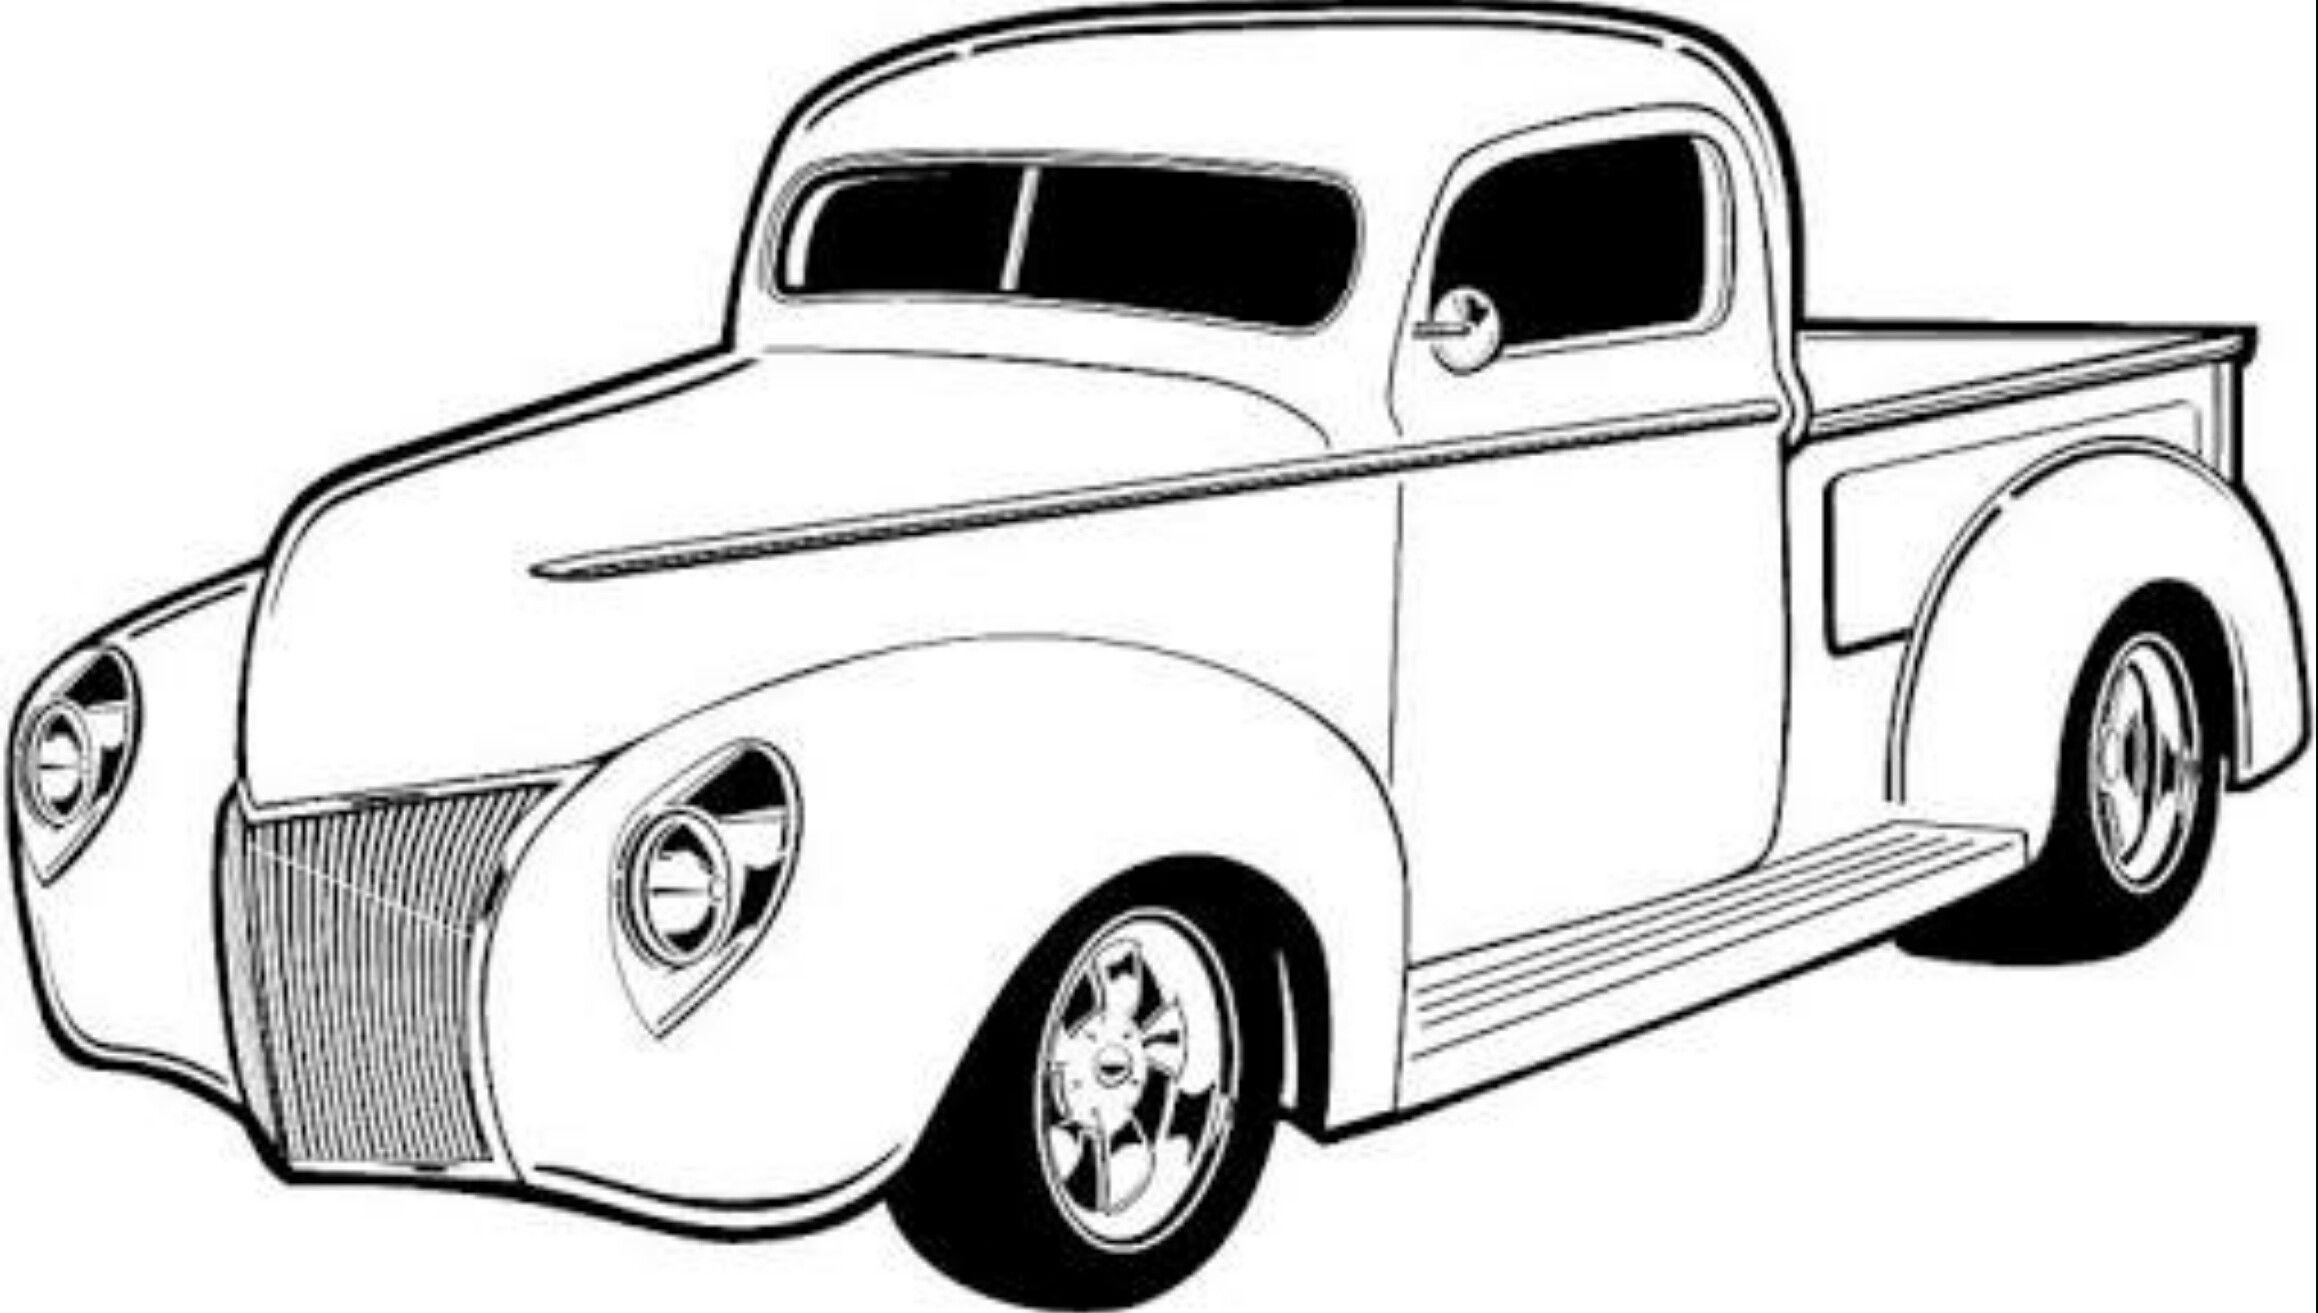 Pin de Guy Crennan en CARS | Pinterest